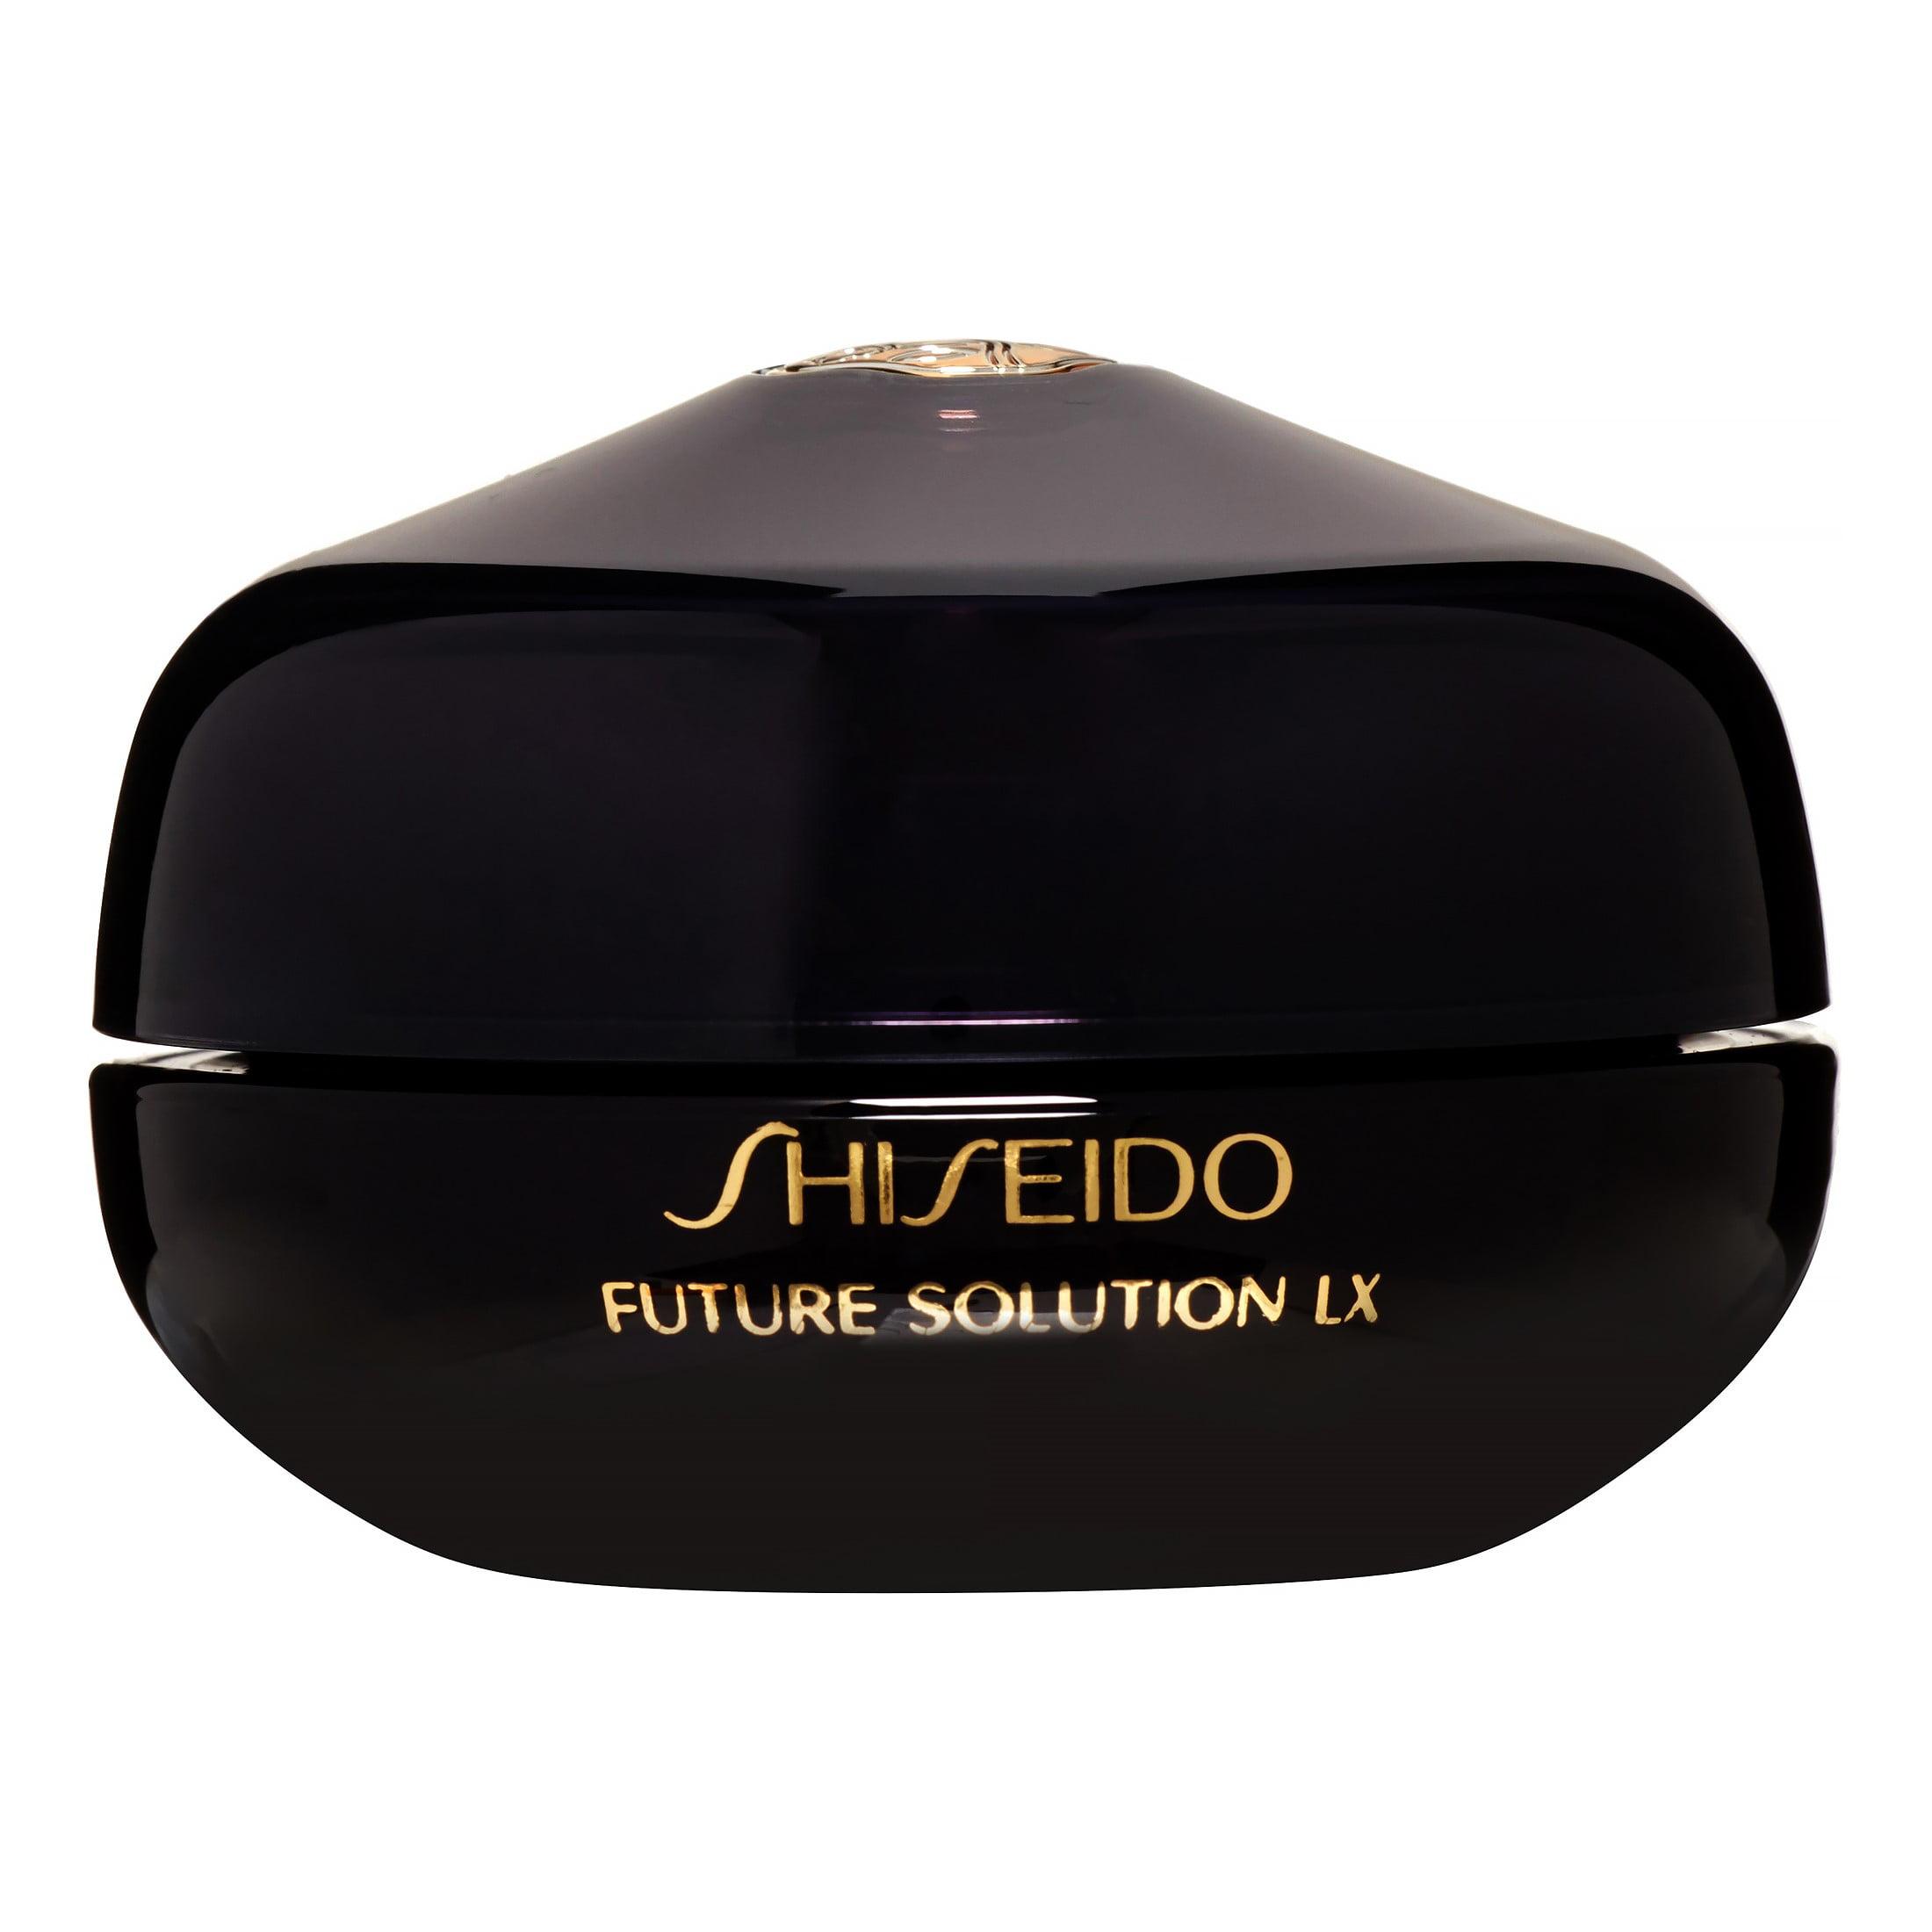 Shiseido Future Solution Lx Eye And Lip Contour Regenerating Cream, 0.54 Oz